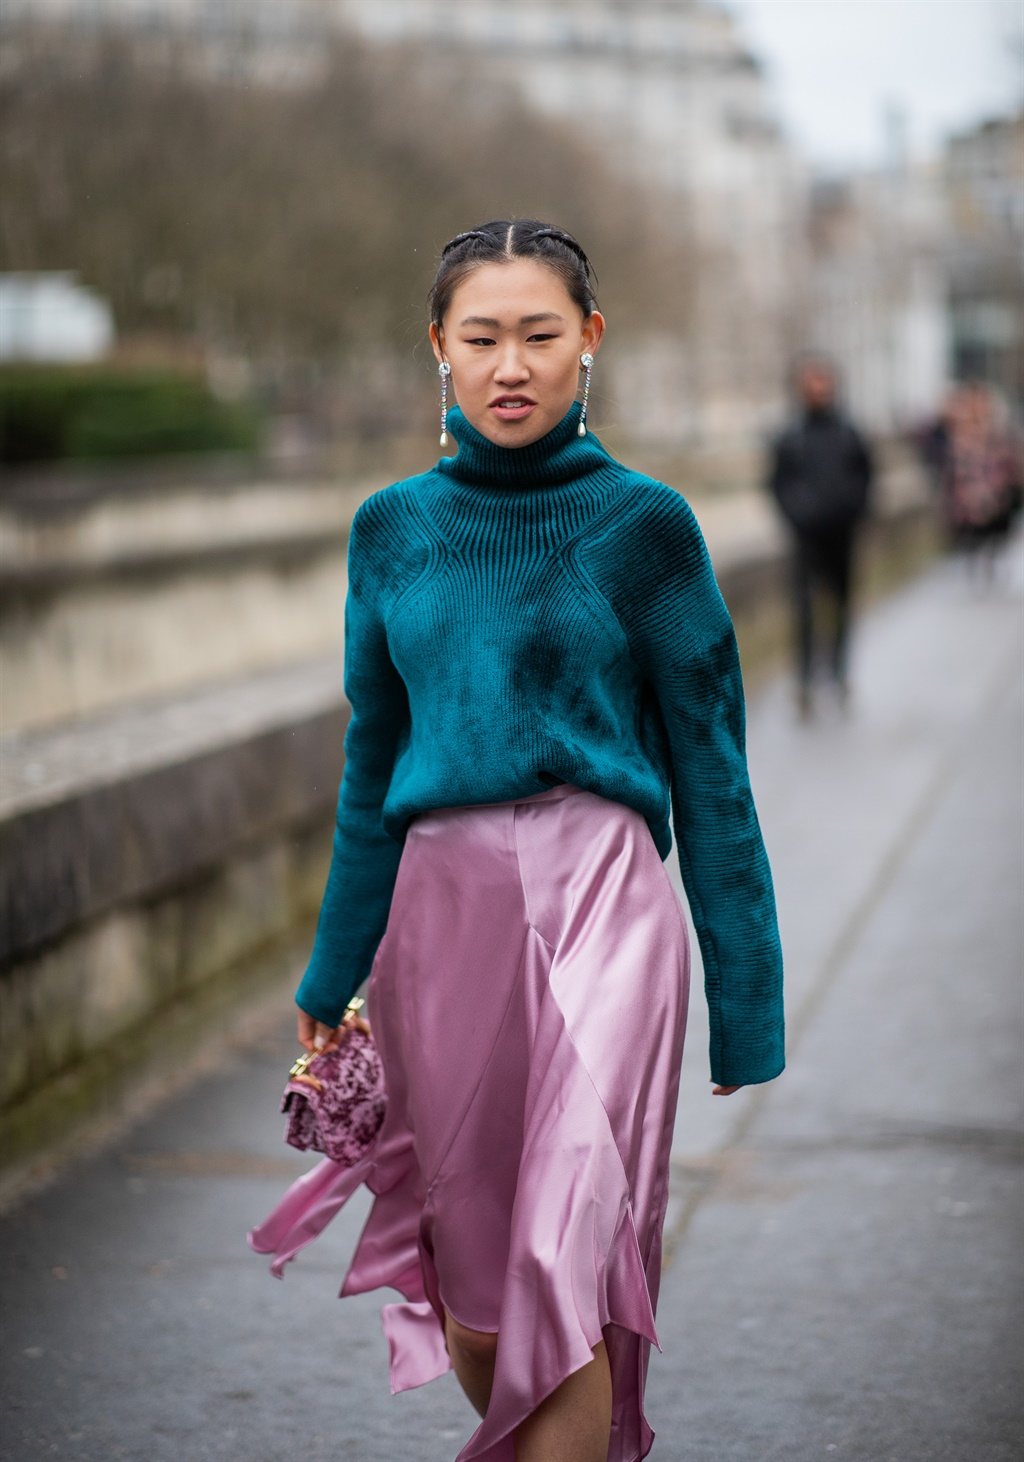 PARIS, FRANCE - MARCH 03: Jaime Xie is seen wearin